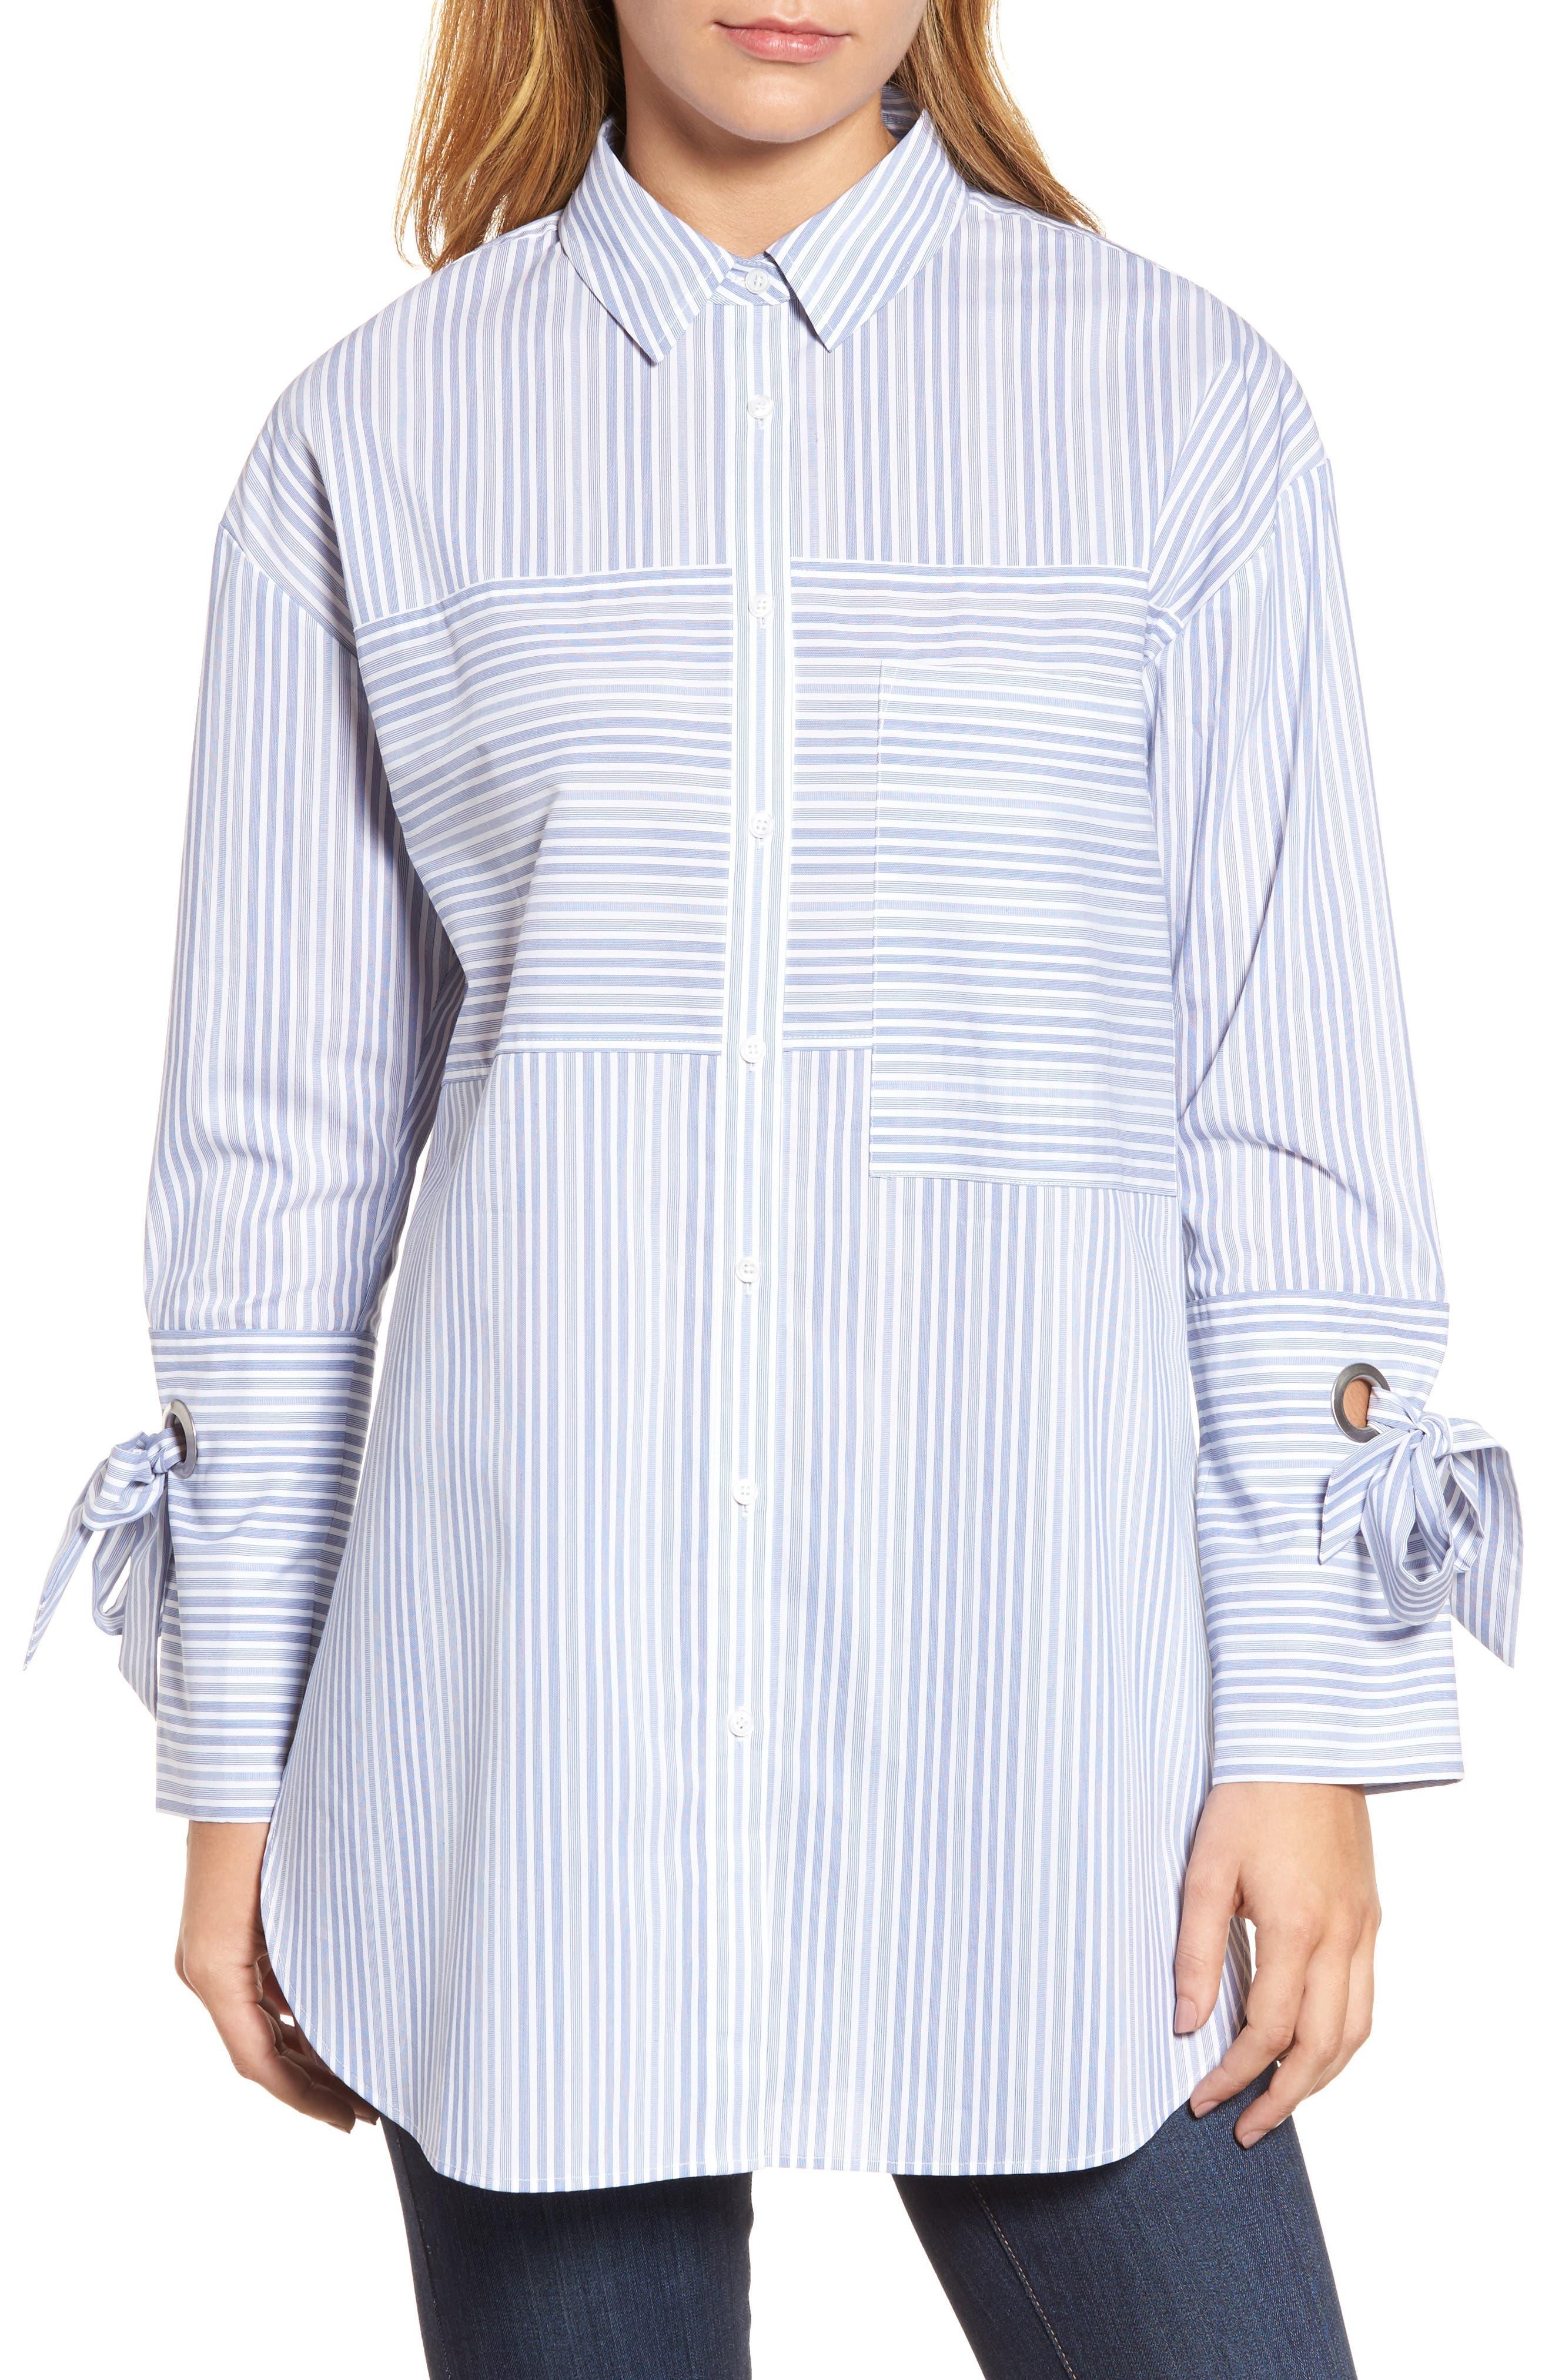 Pocket Detail Stripe Tunic Top,                         Main,                         color, Blue- White Stripe